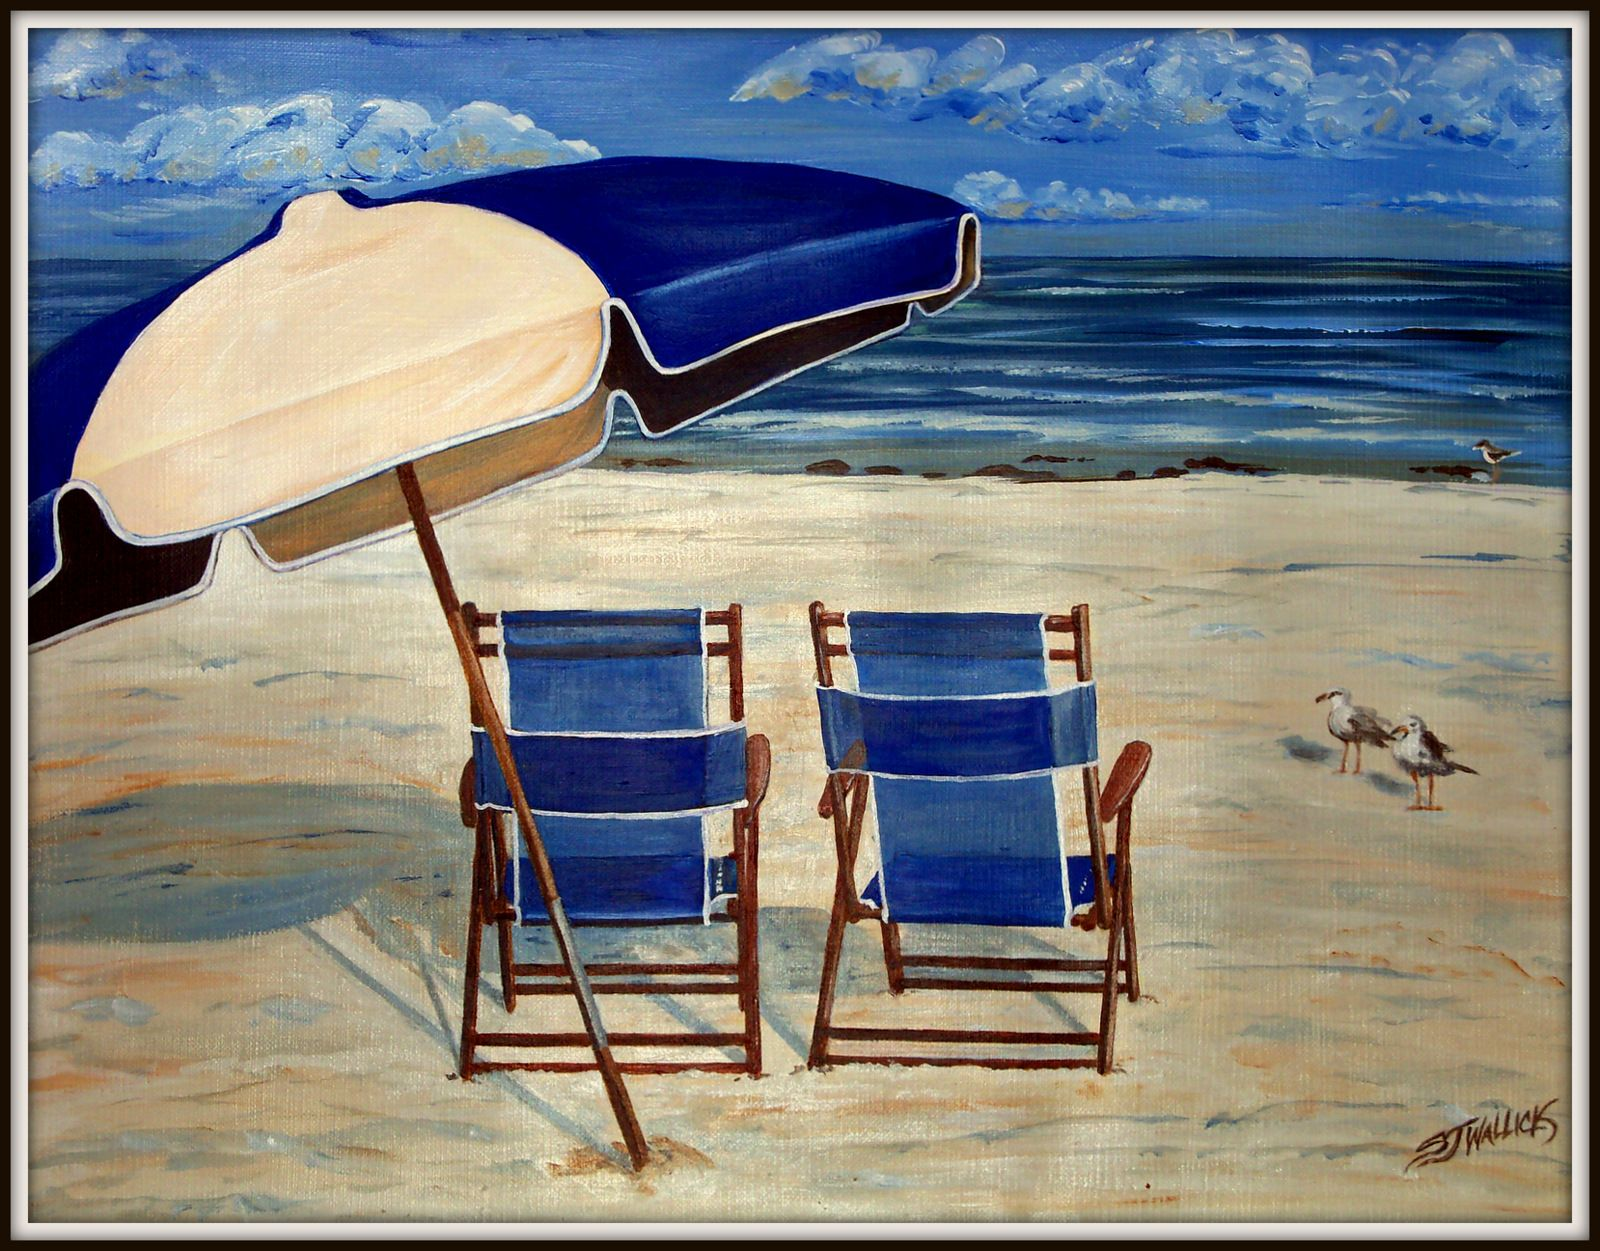 Beach Chair With Umbrella Painting. Beach chairs